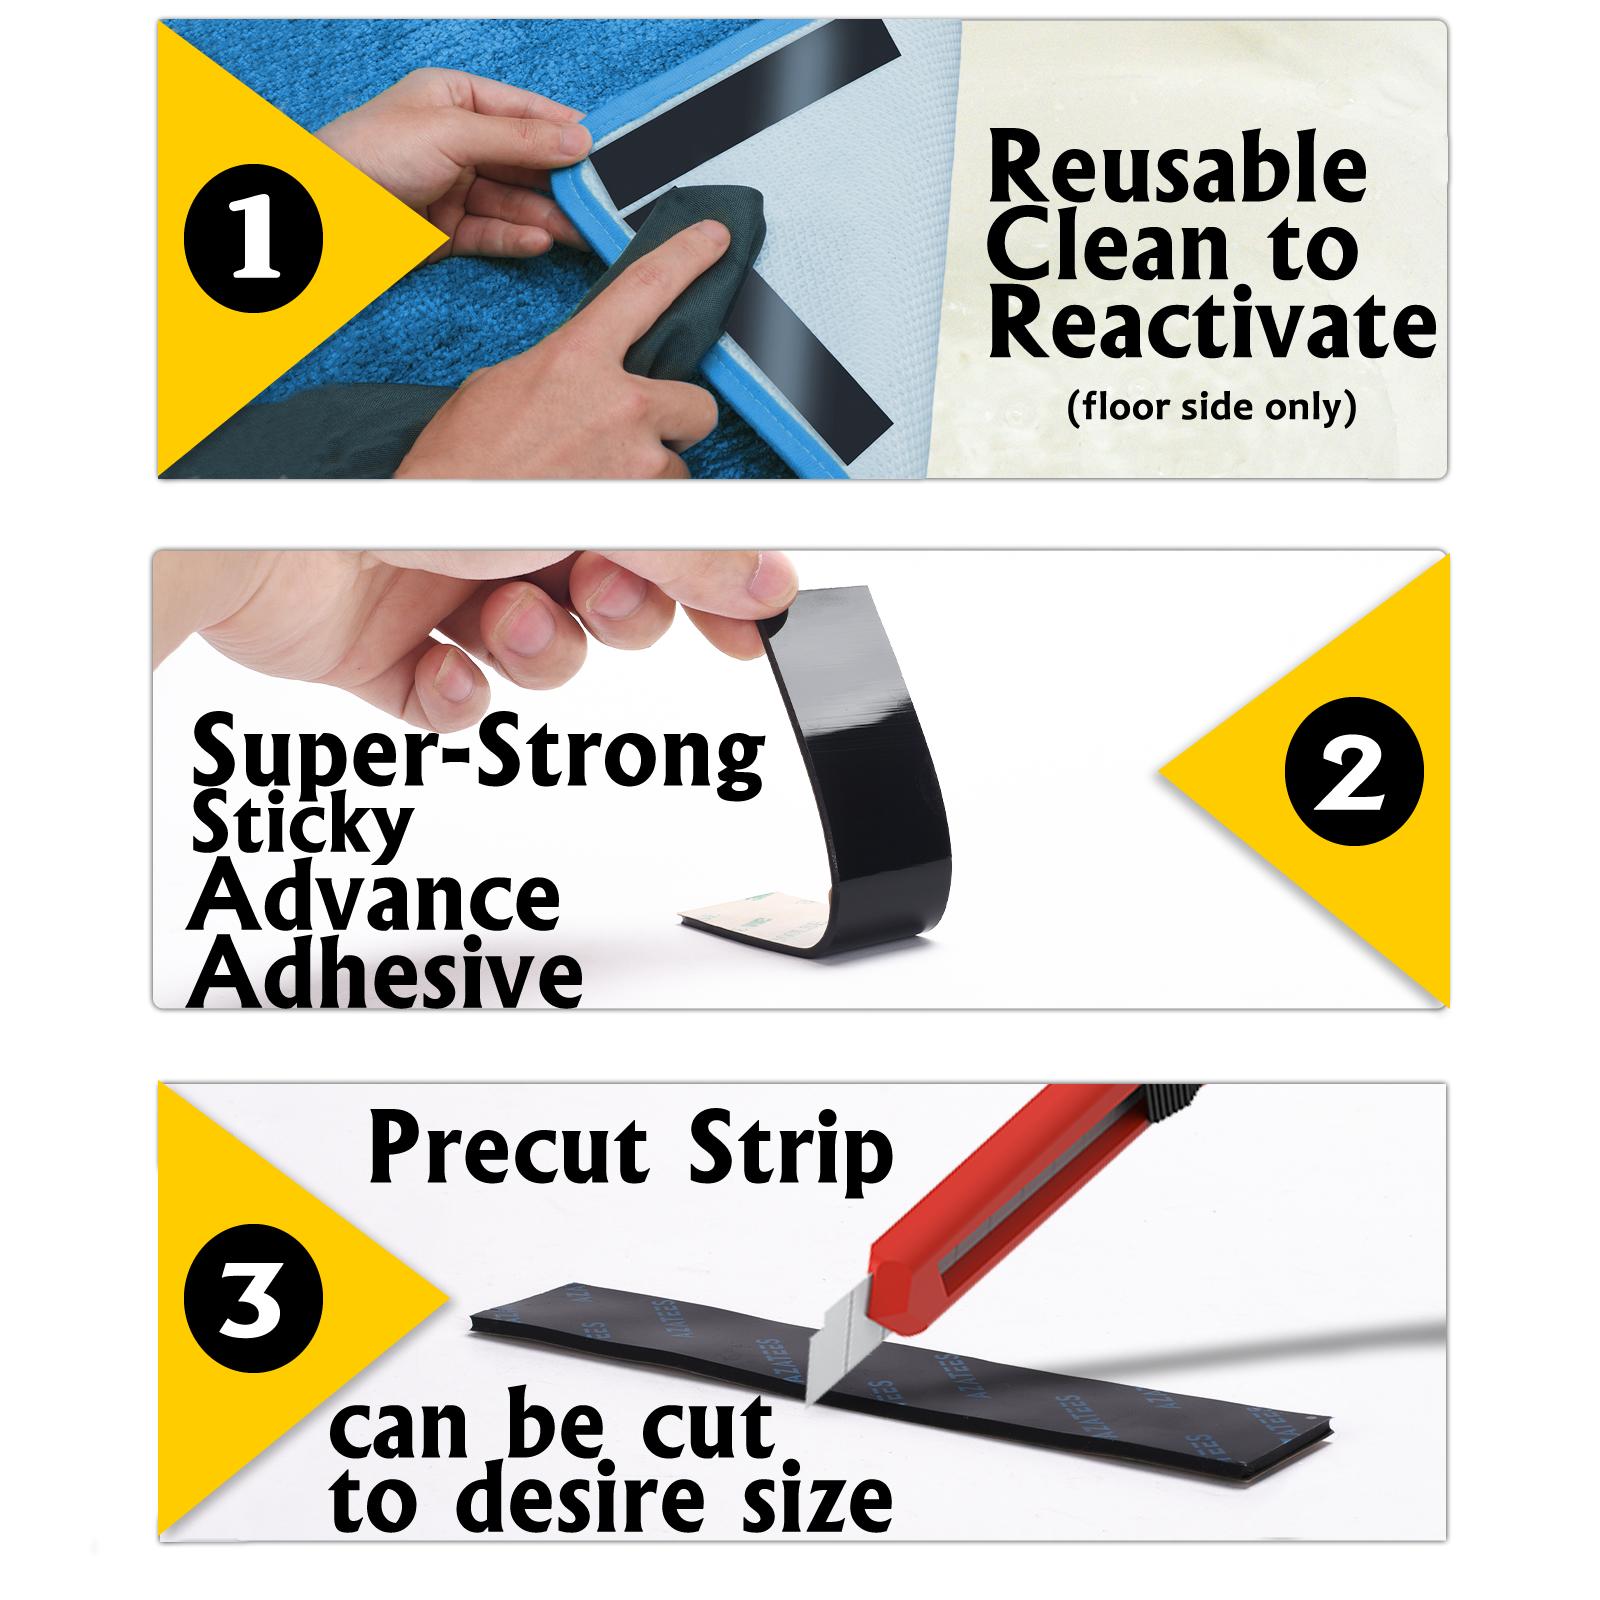 10 Pcs Anti-slip and Reusable Rug Gripper 130x25 Mm